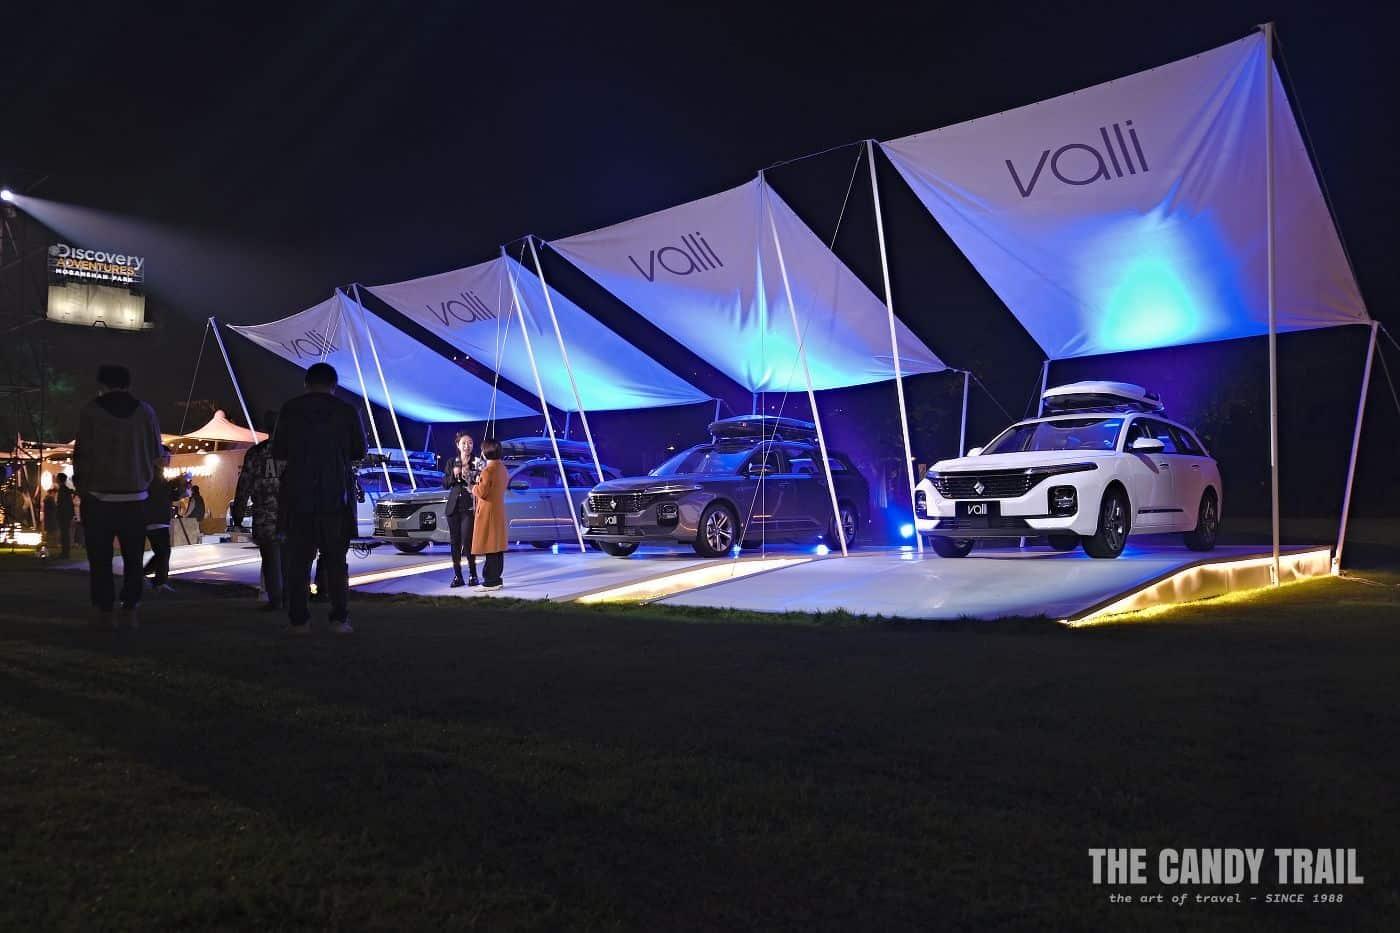 TV presenters Valli car launch event china